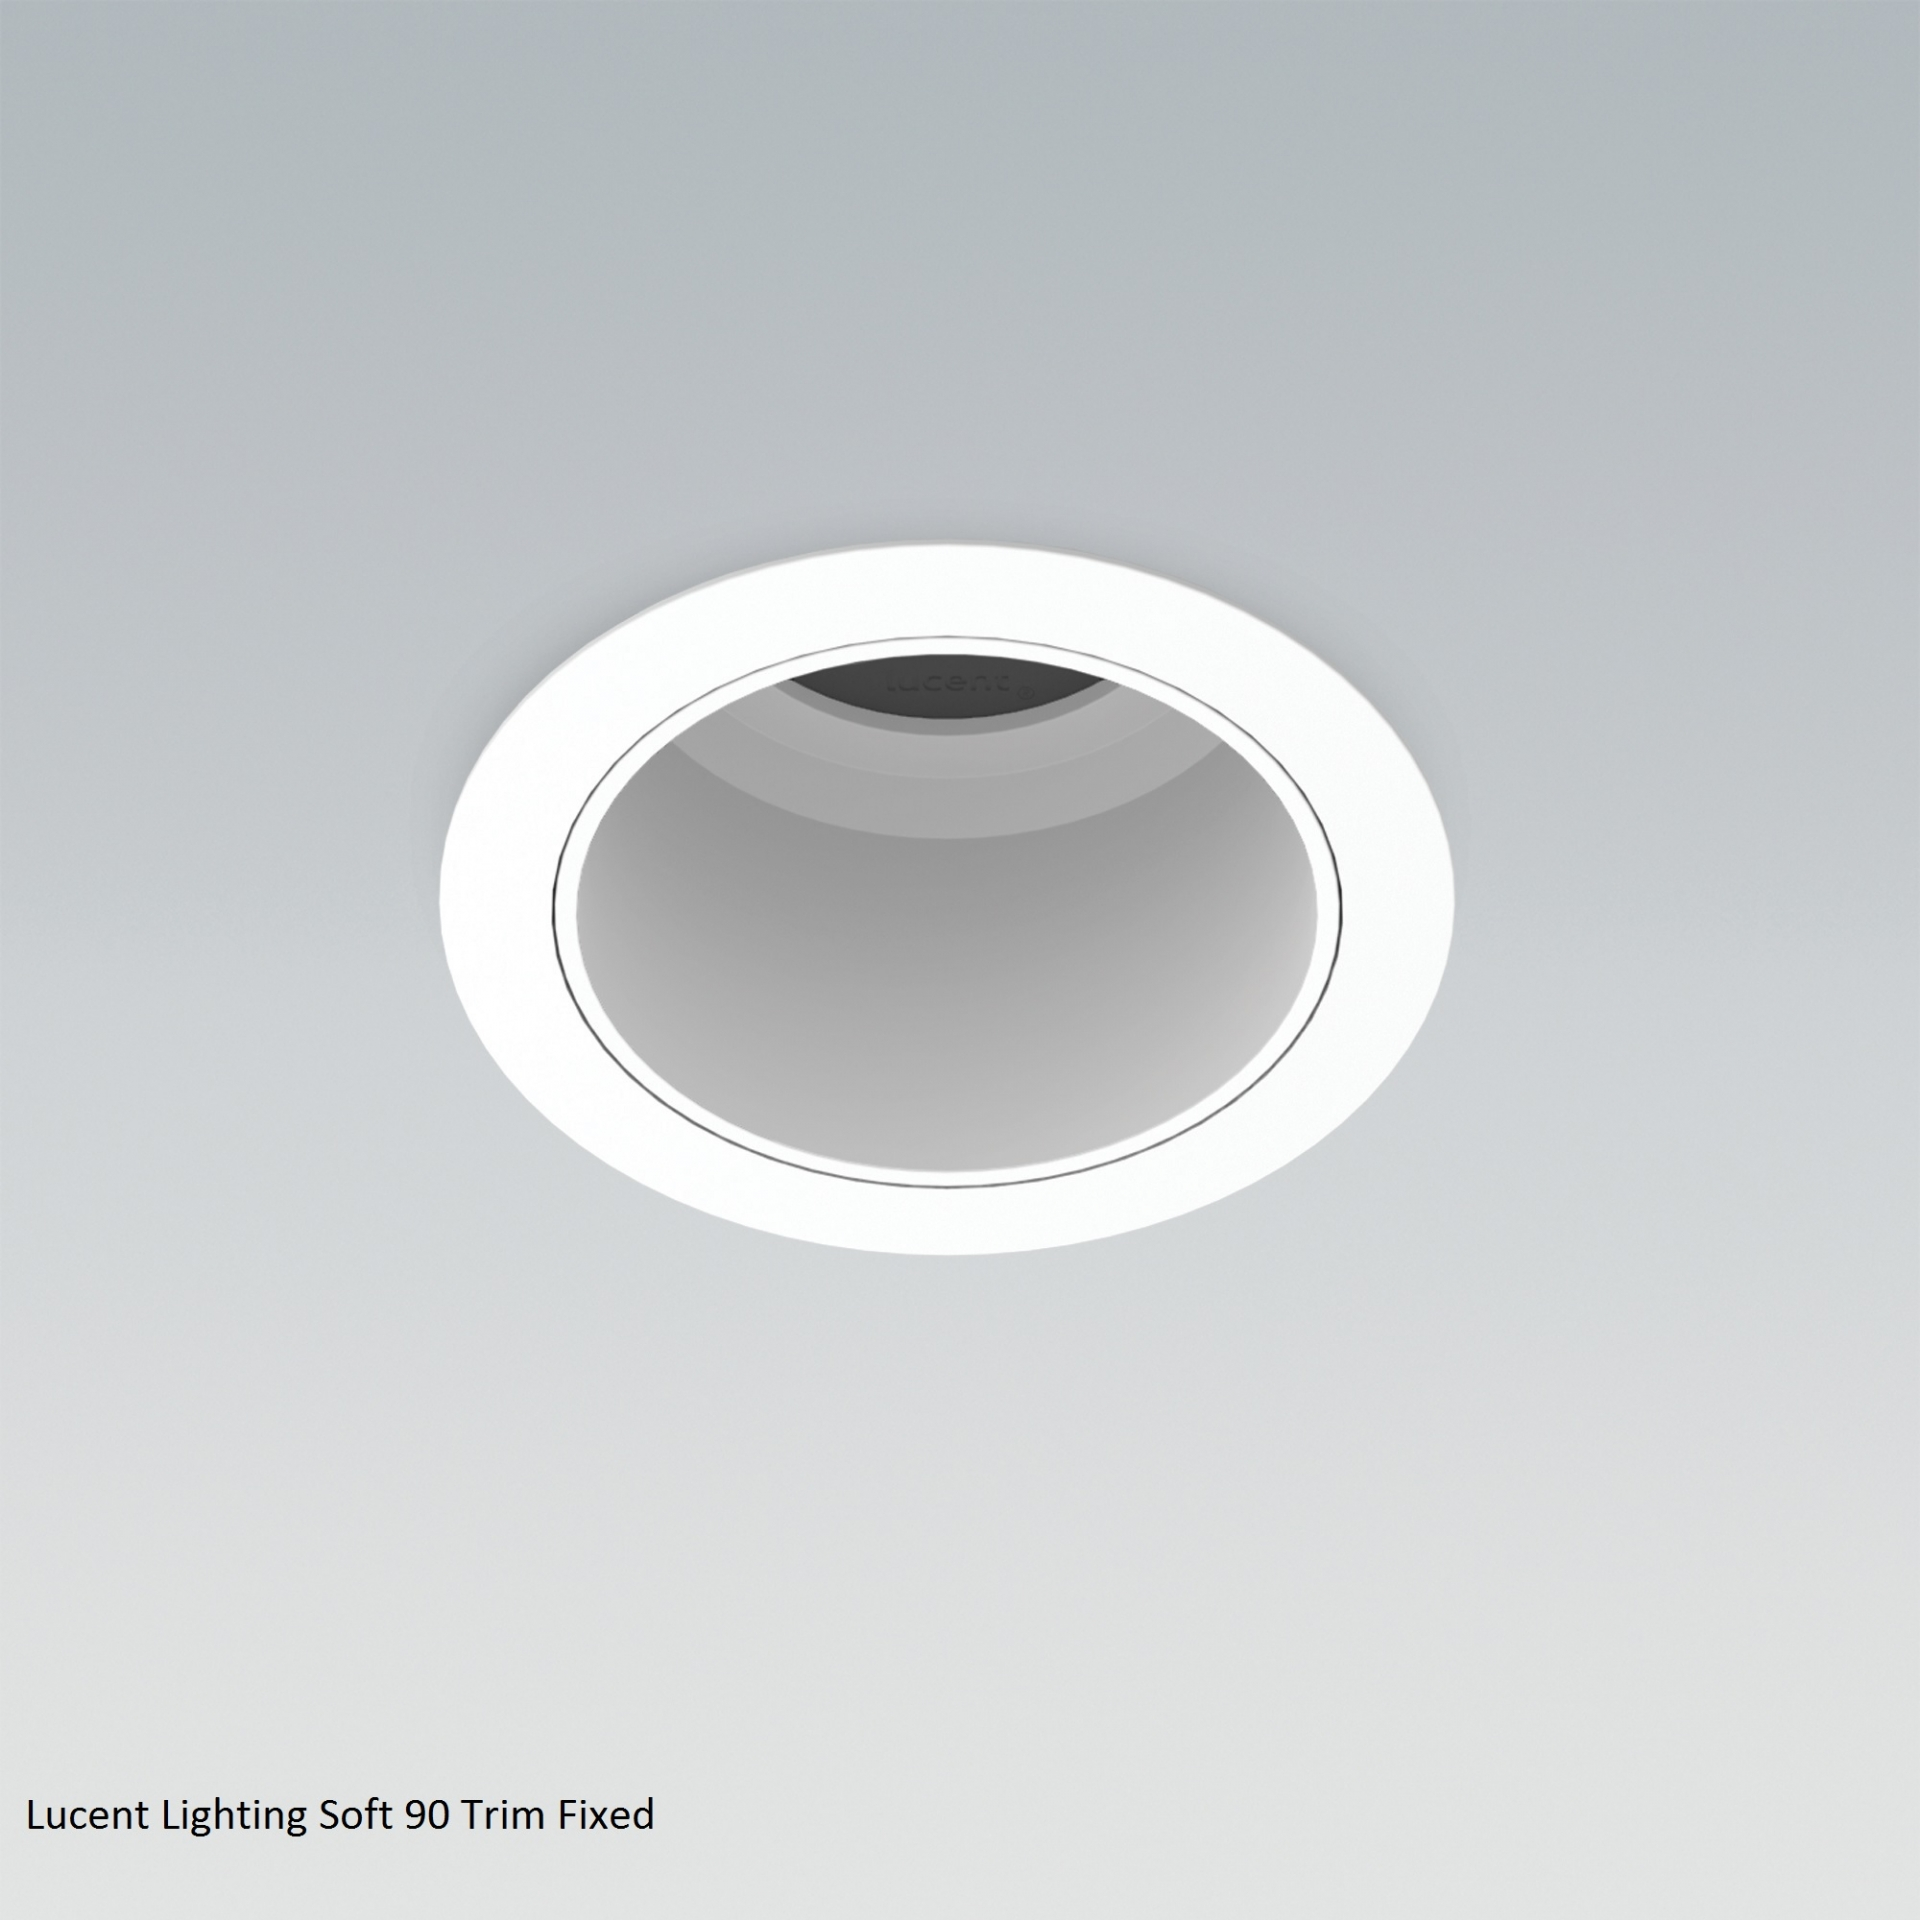 lucent-lighting-soft-90-trim-fixed1552905276